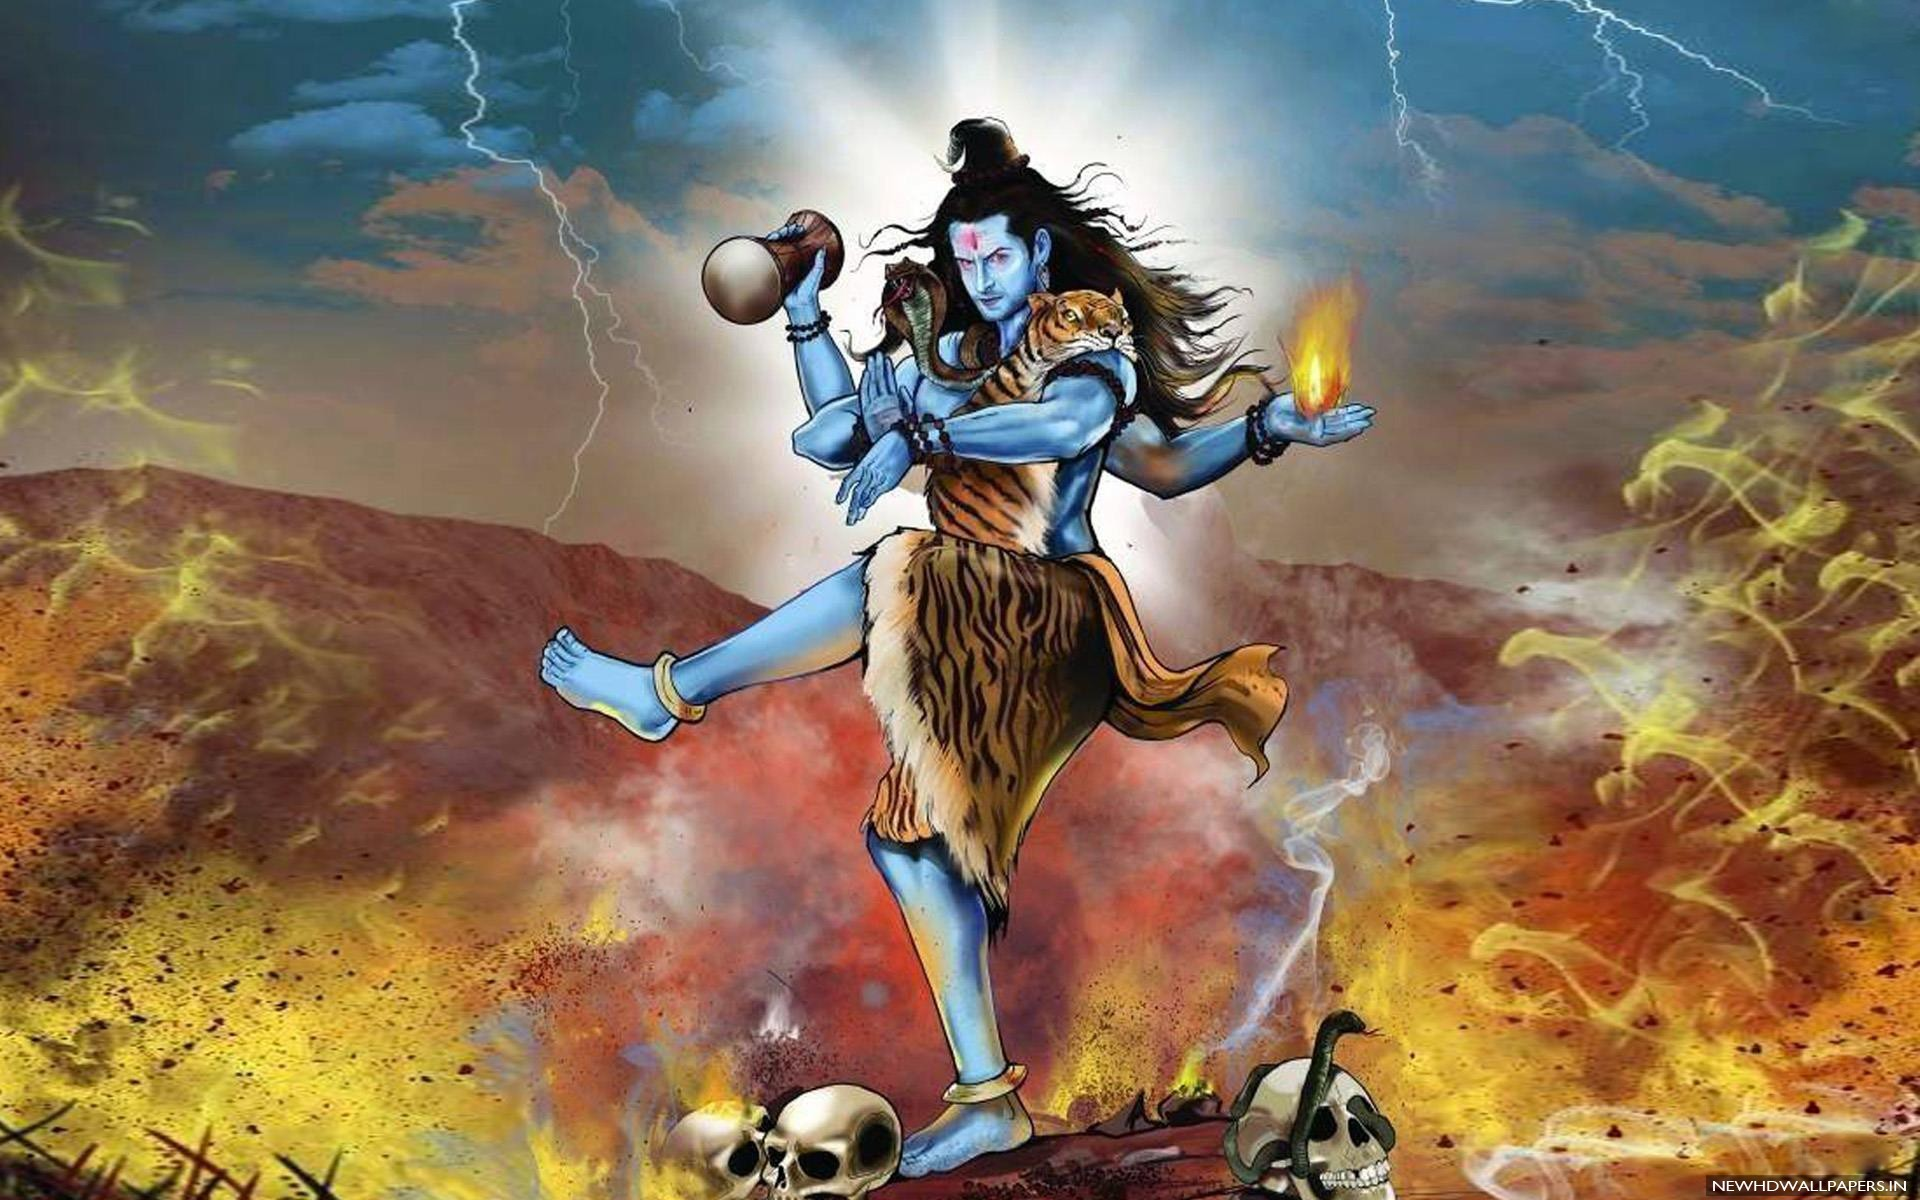 Hd wallpaper shiva - Lord Shiva Tandav